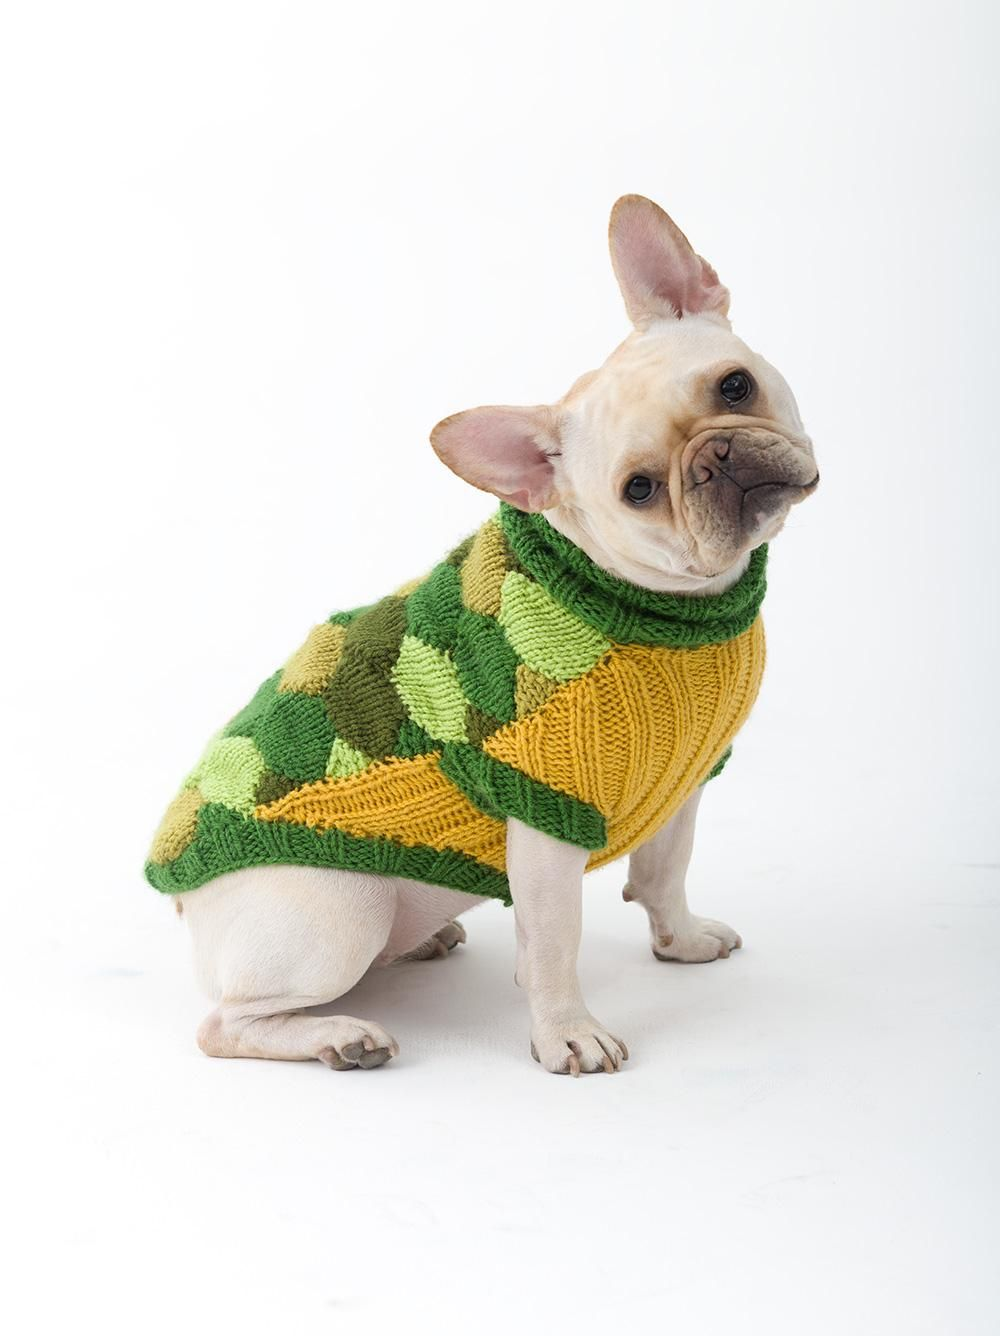 Lion Brand Yarn On Dog Sweaters Pet Costumes Knit Dog Sweater